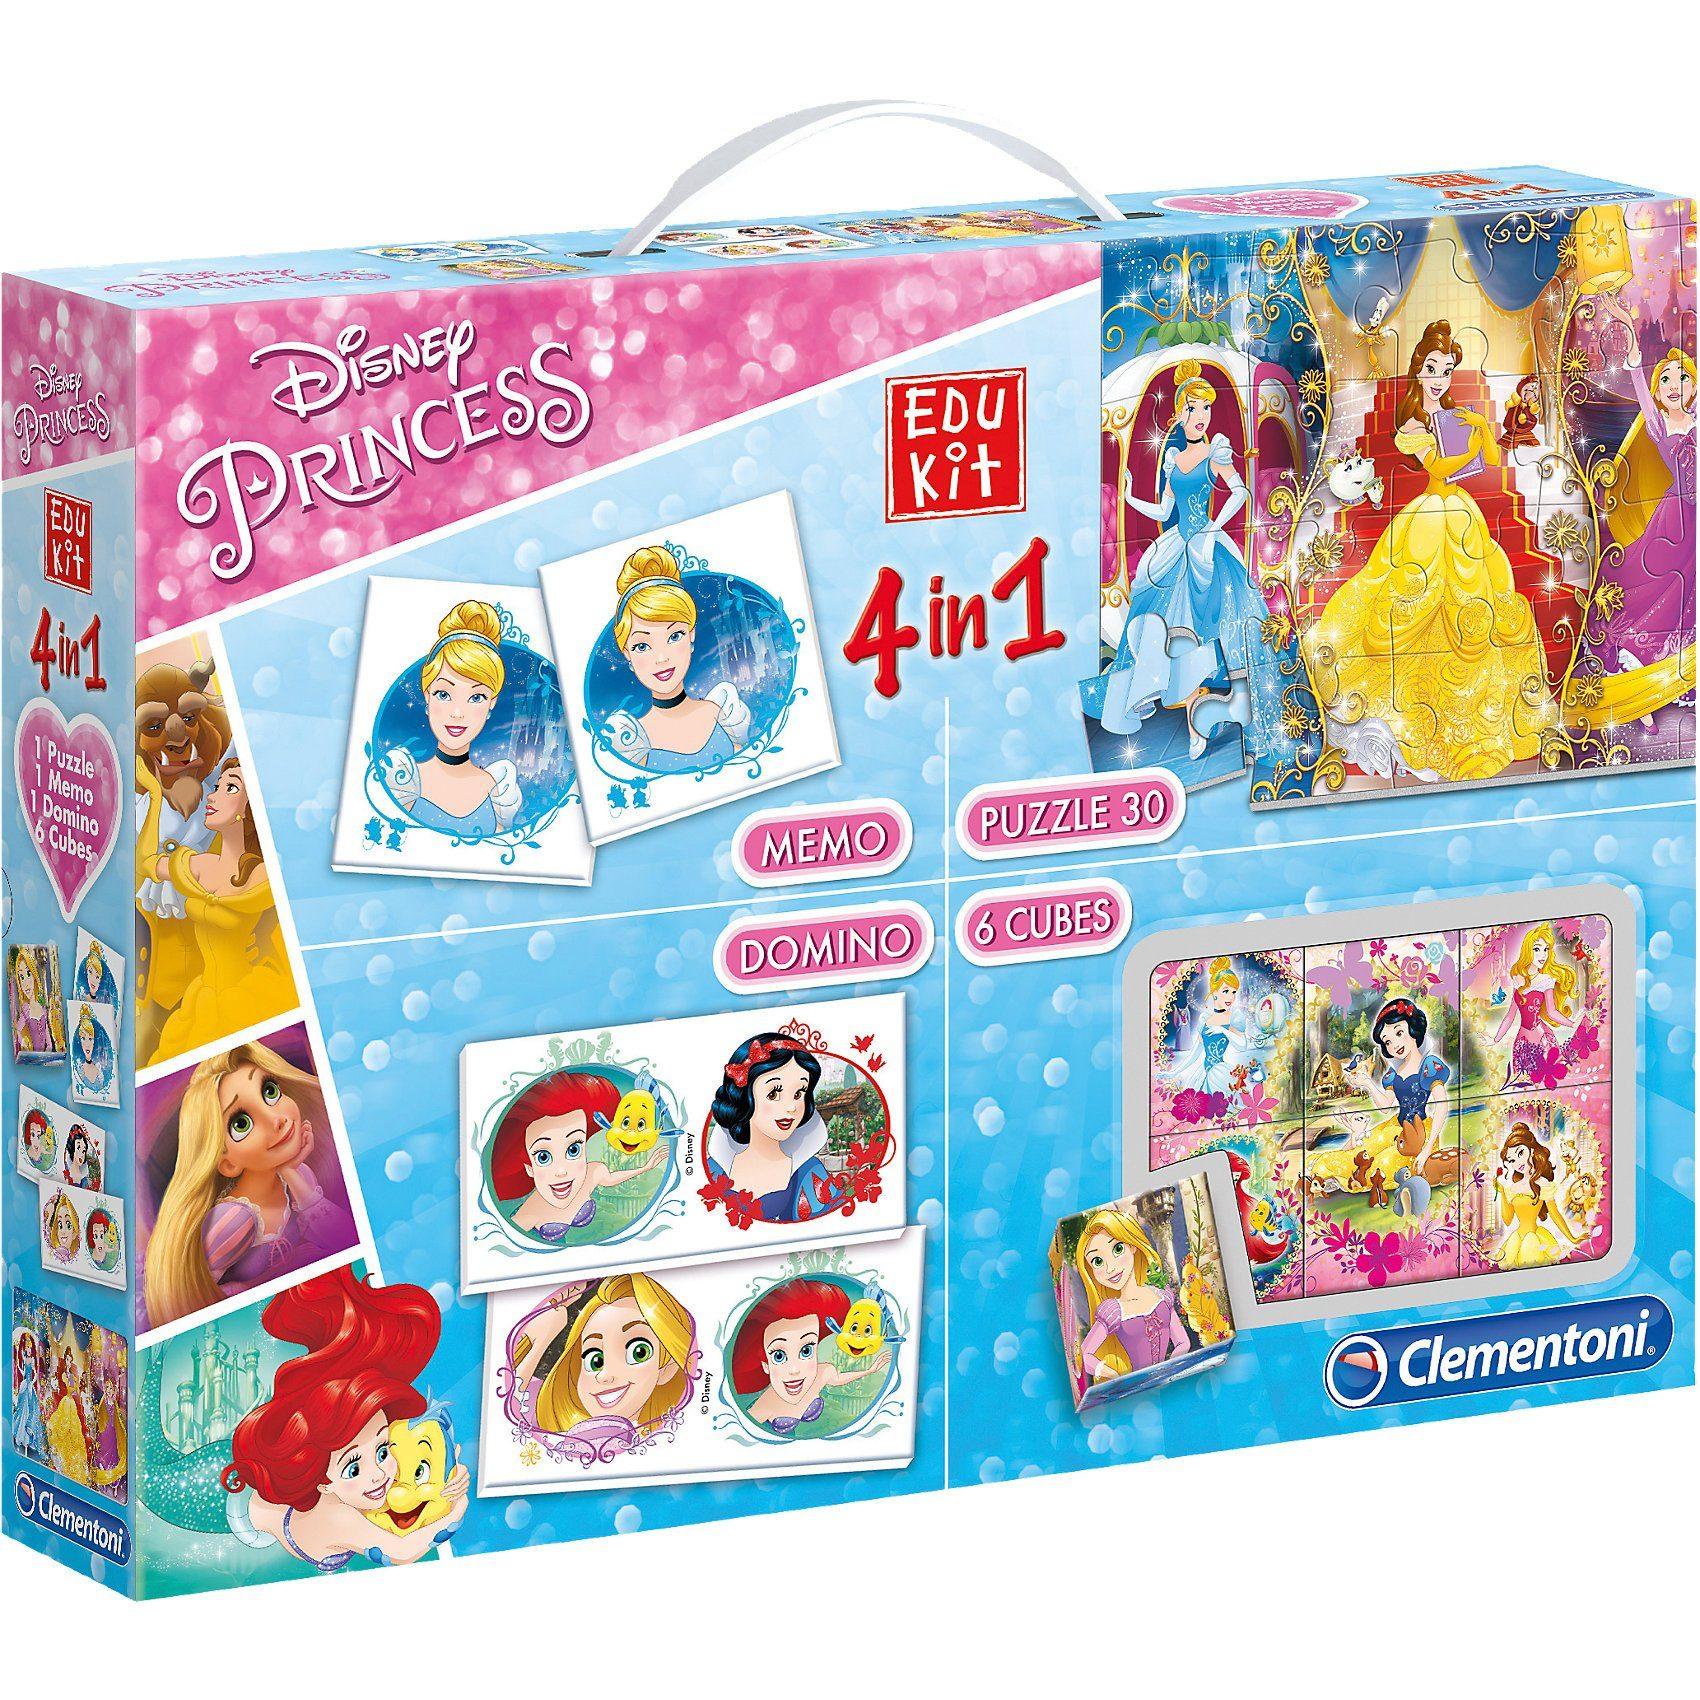 Clementoni® Edukit 4 in 1 - Disney Princess